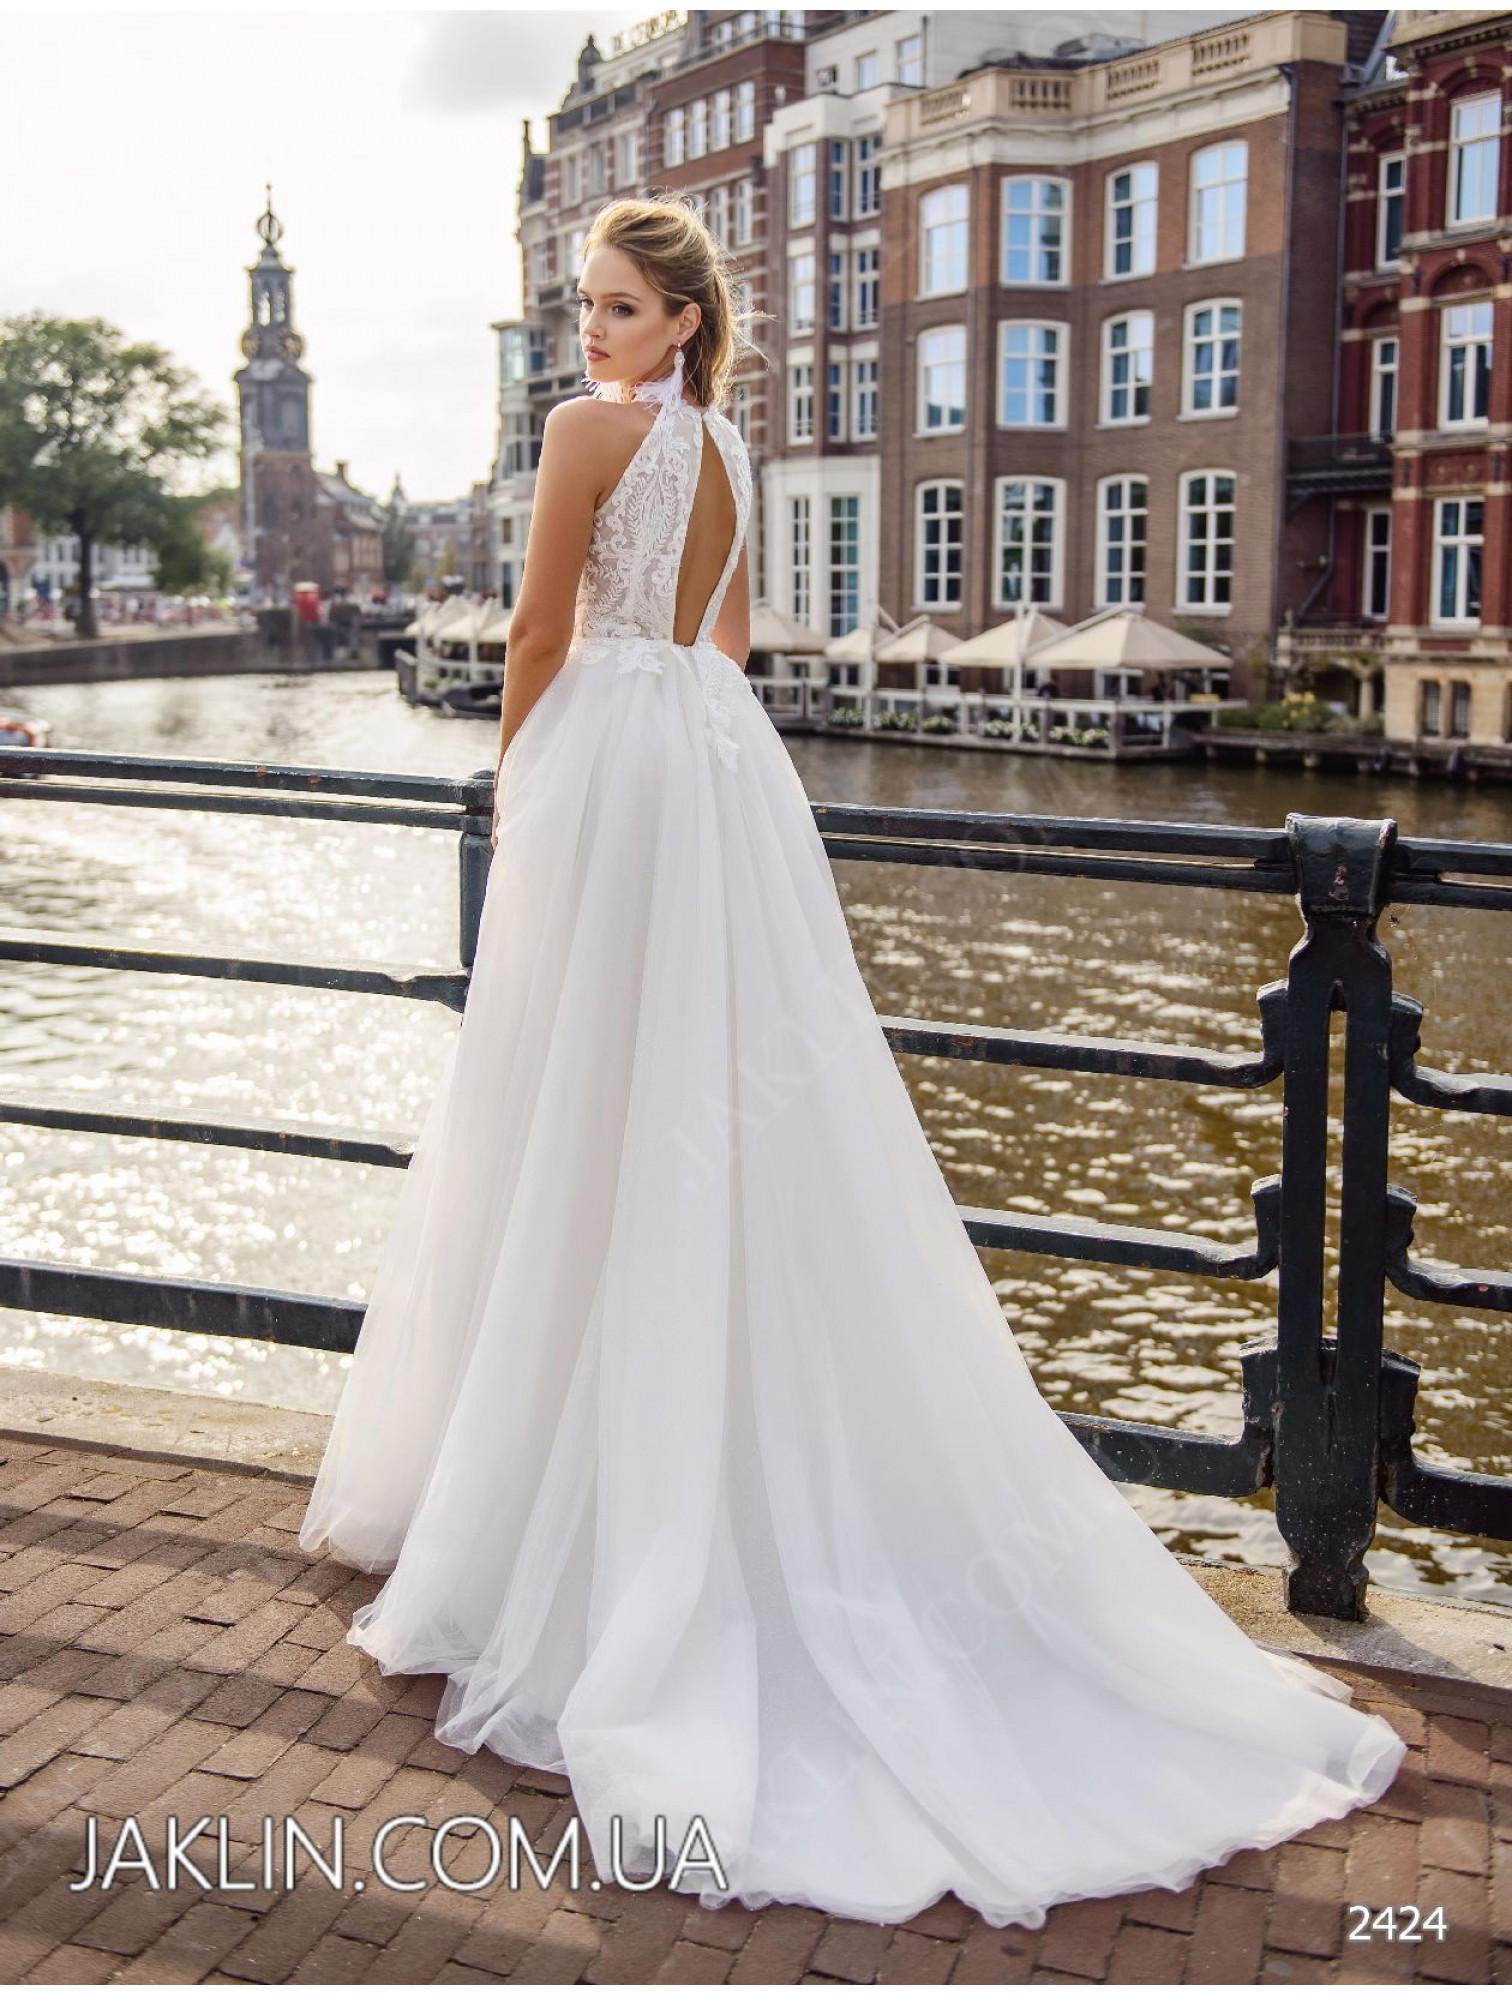 Wedding dress 2424